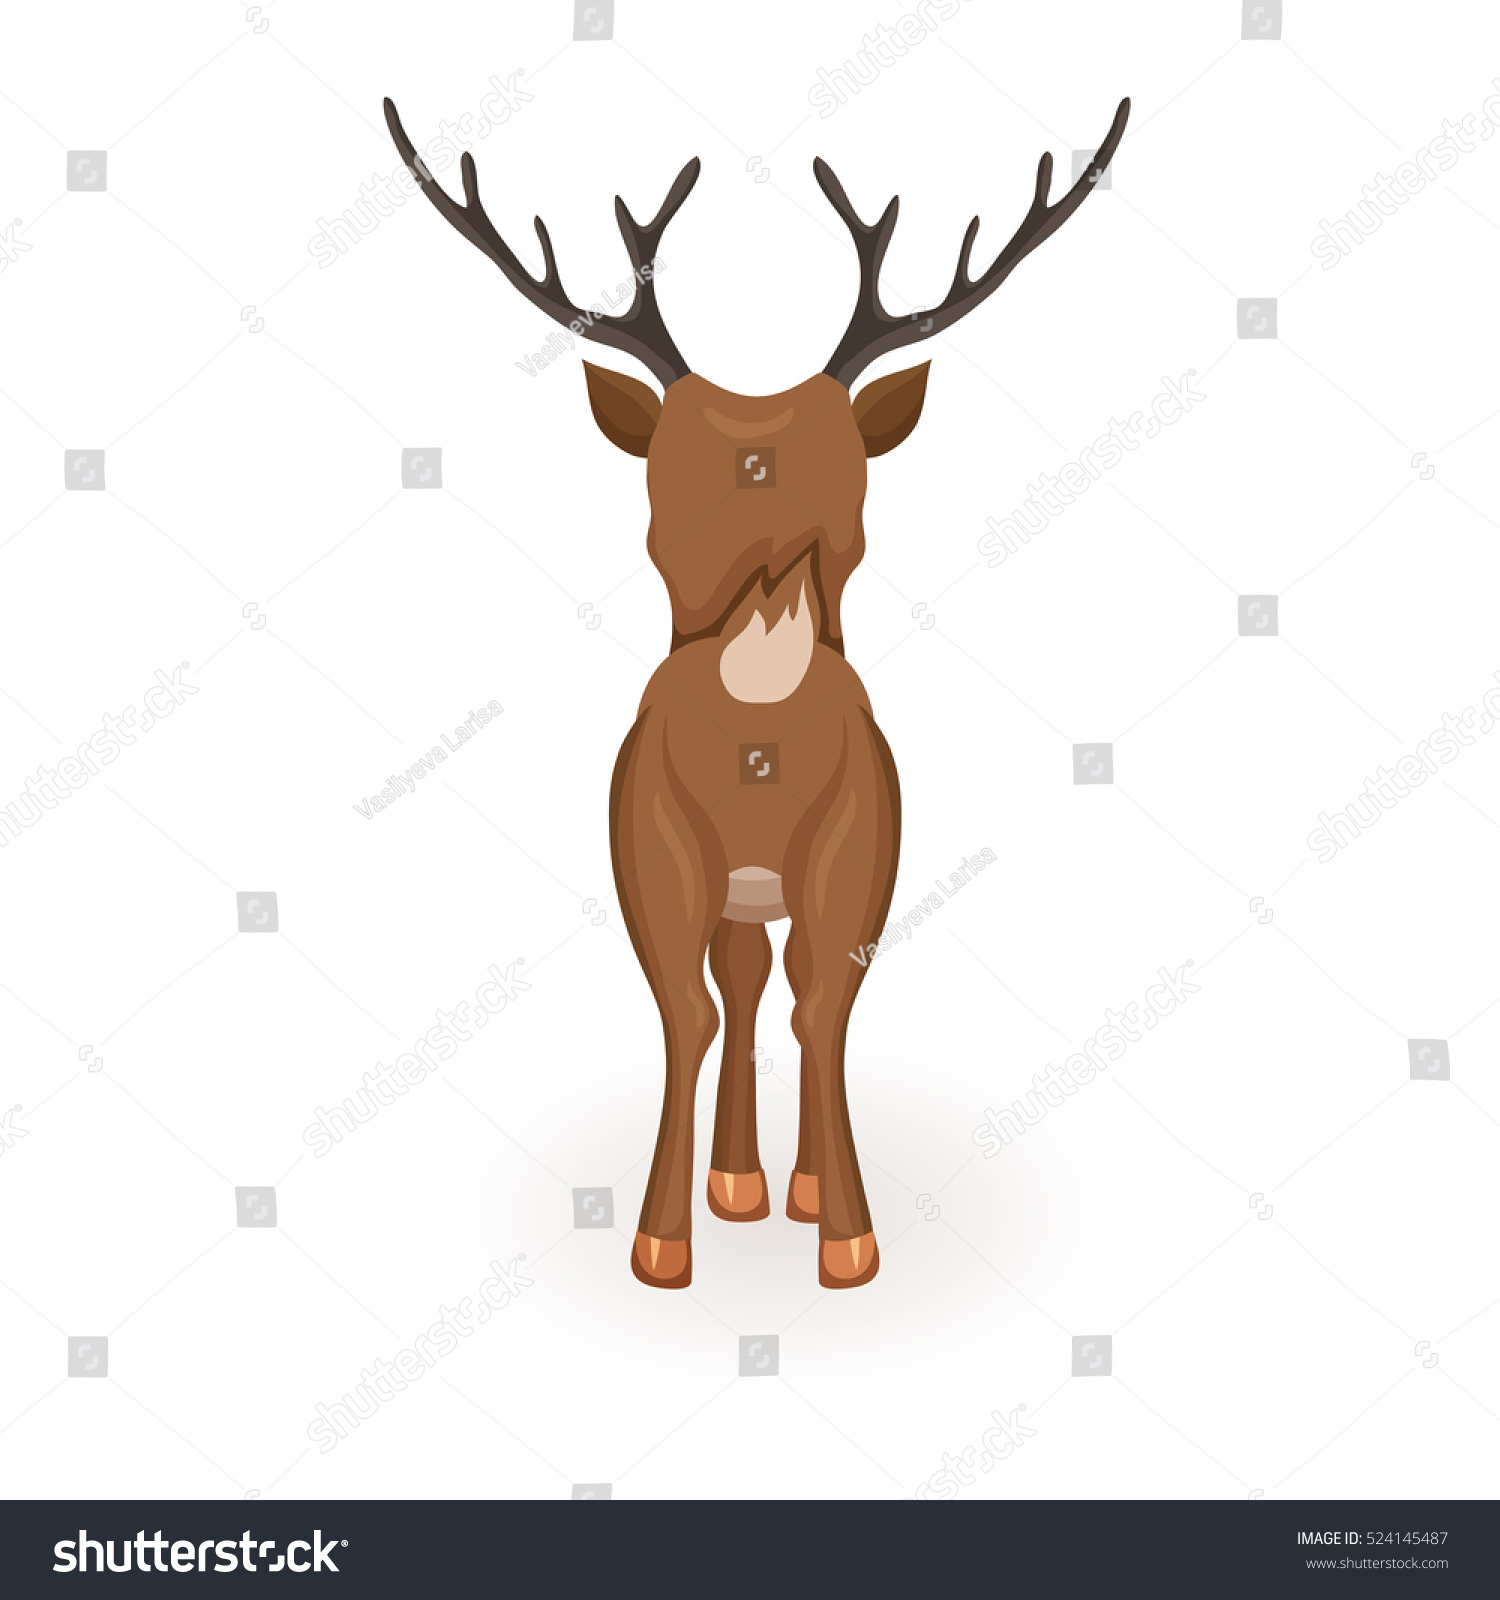 Reindeer Christmas Vector Illustration Stand Deer Stock ...